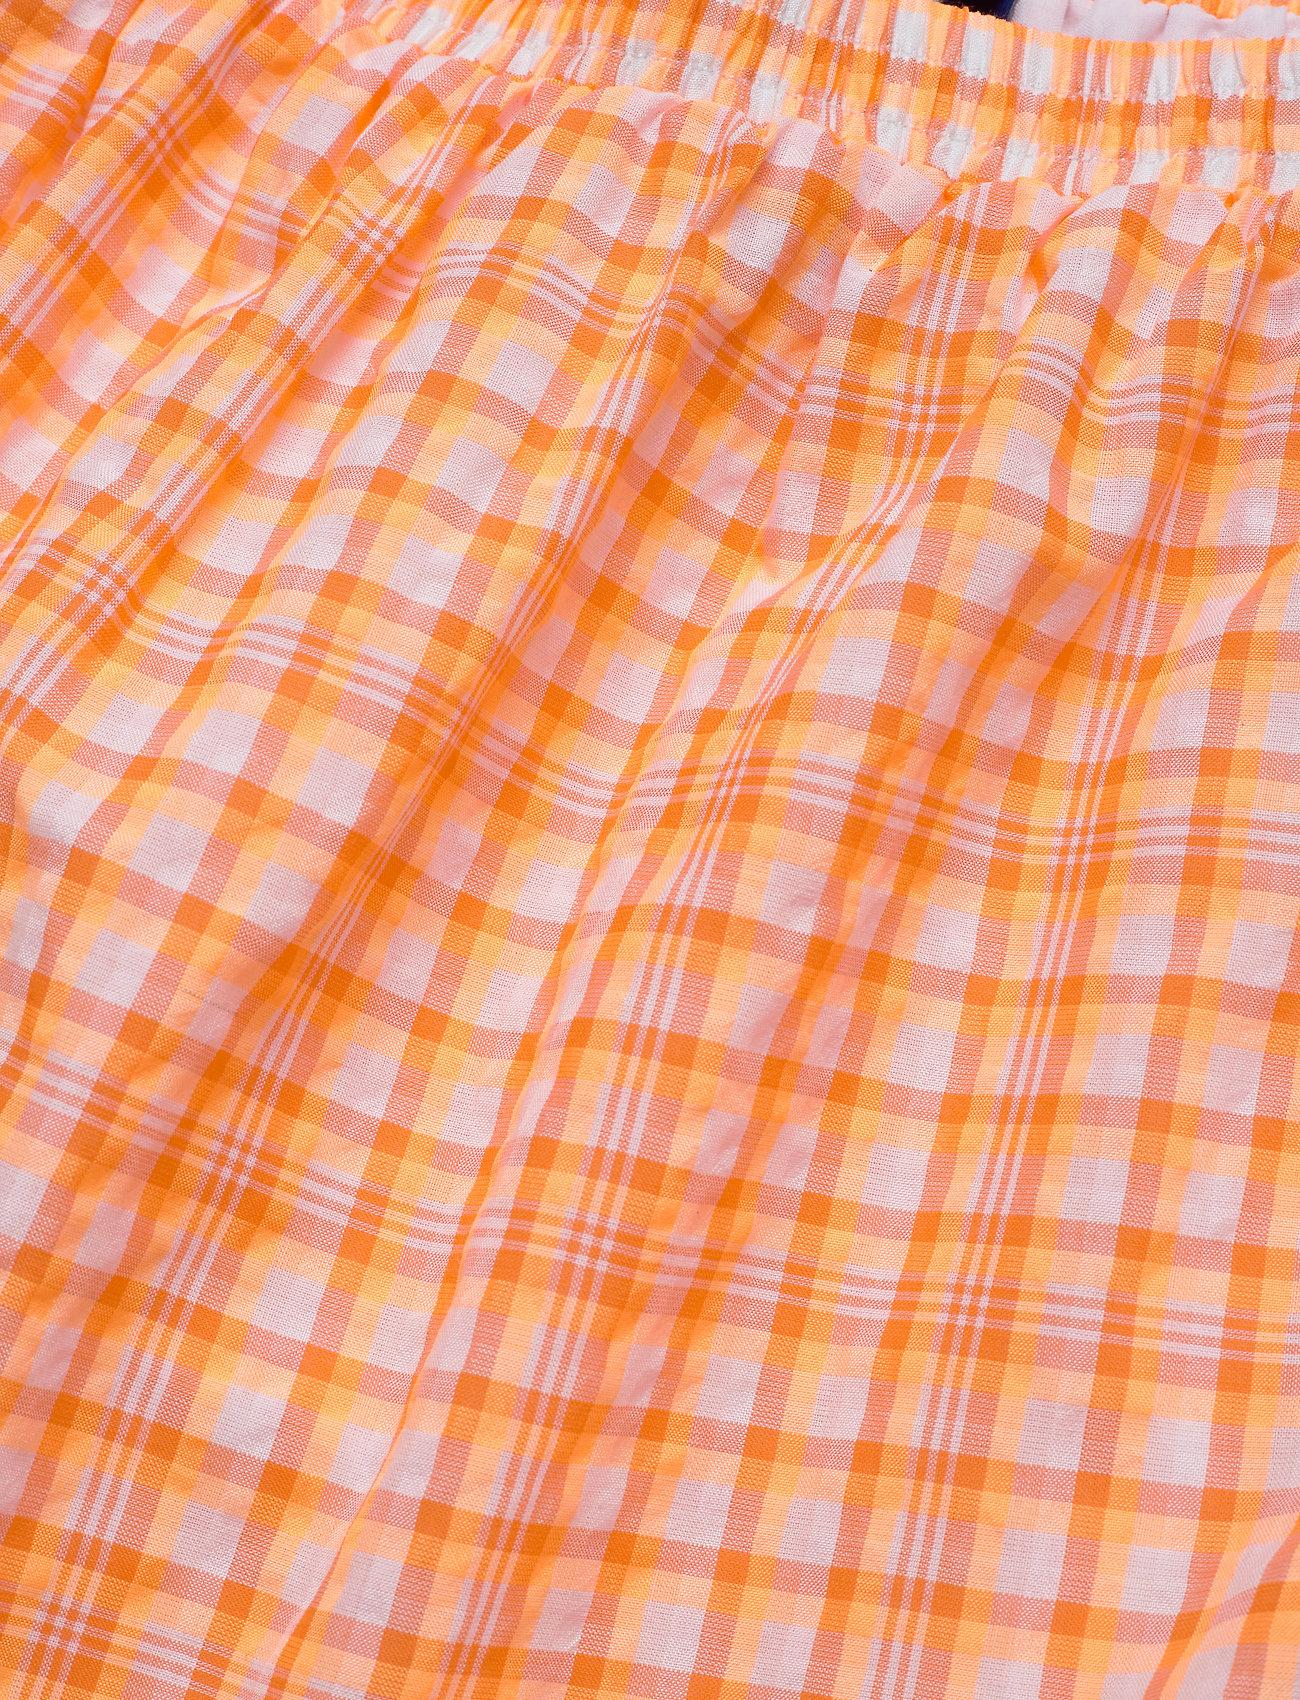 Trudy Skirt (Orange) (62.50 €) - Résumé UbpIn